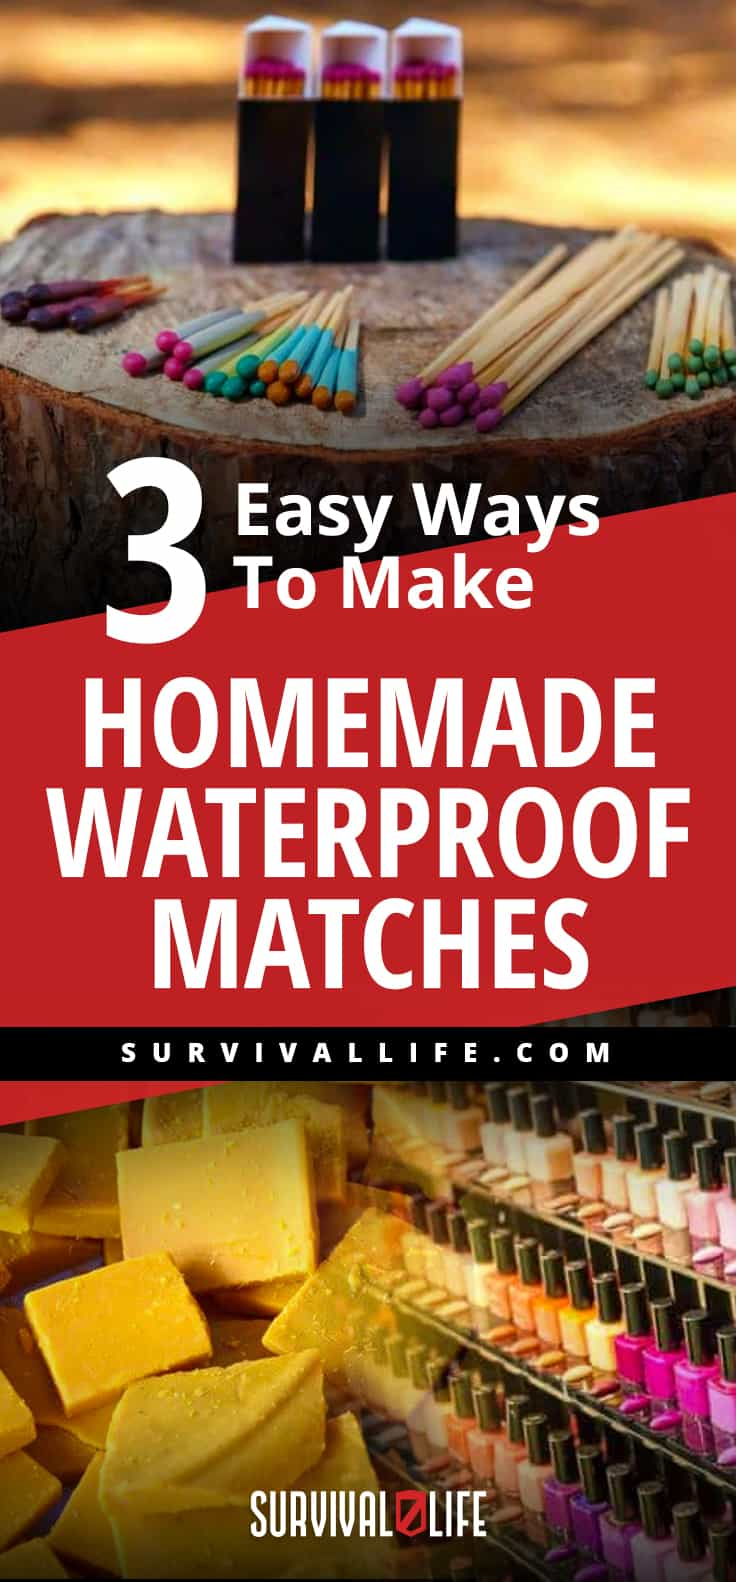 3 Easy Ways To Make Homemade Waterproof Matches | https://survivallife.com/homemade-waterproof-matches/